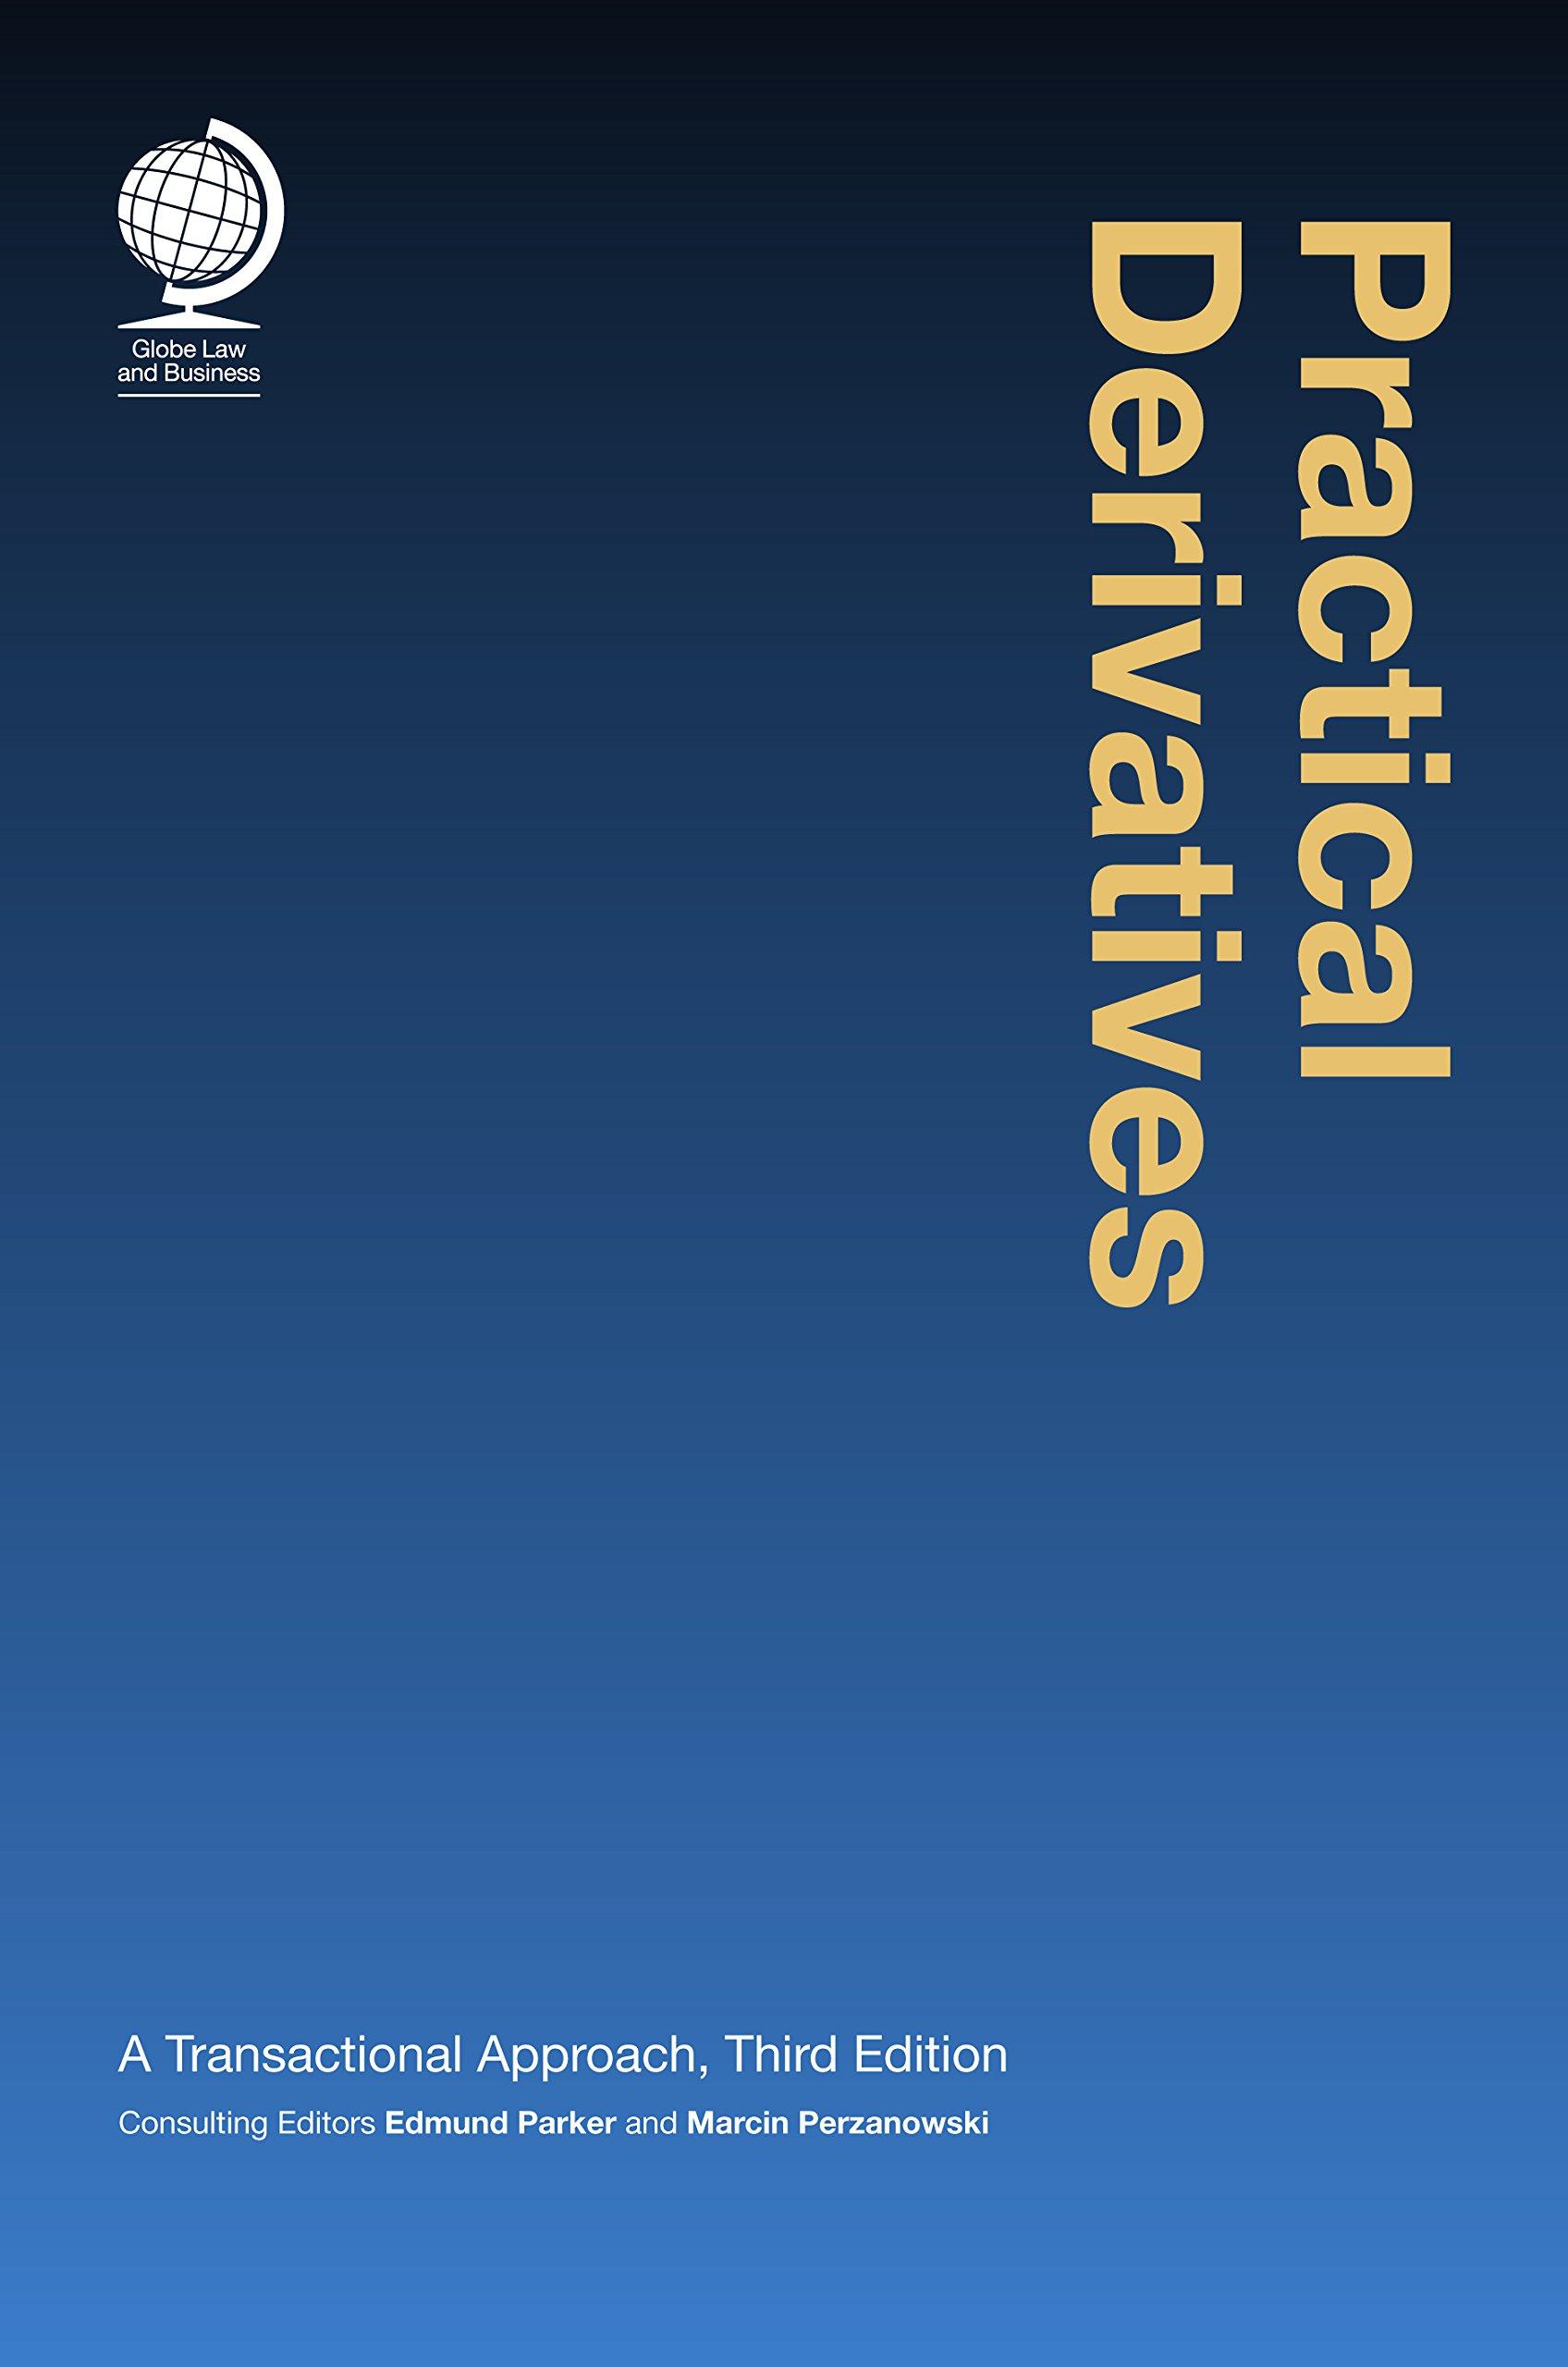 Practical Derivatives: A Transactional Approach, Third Edition